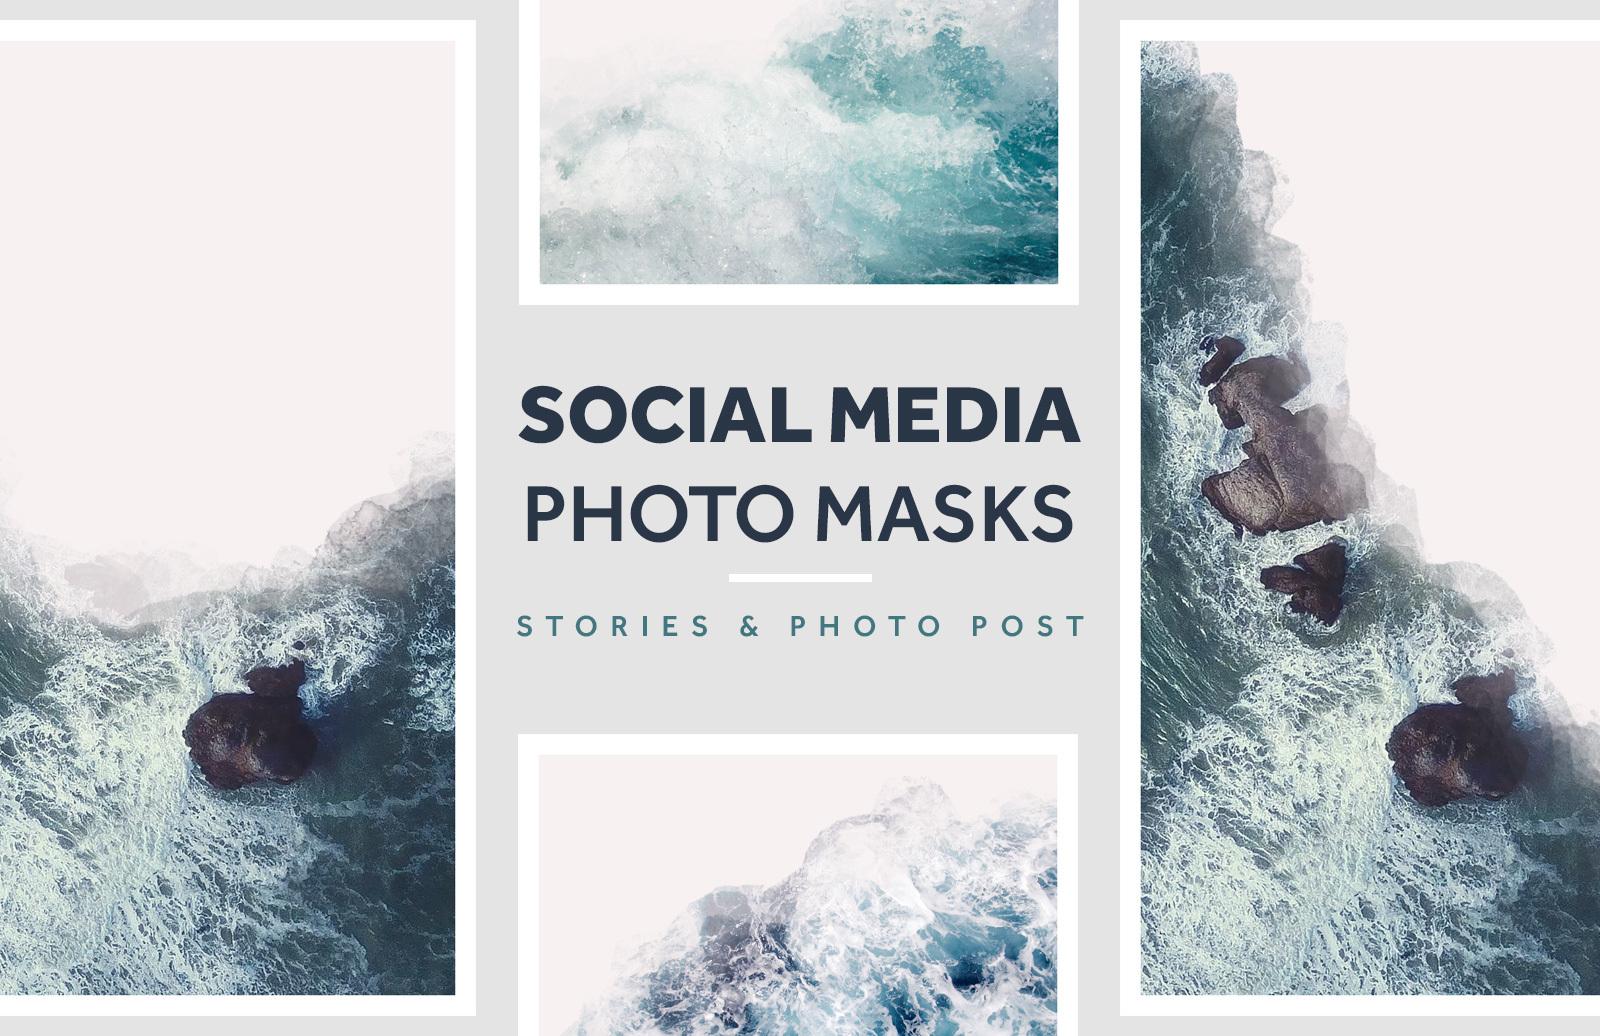 Social Media Photo Masks